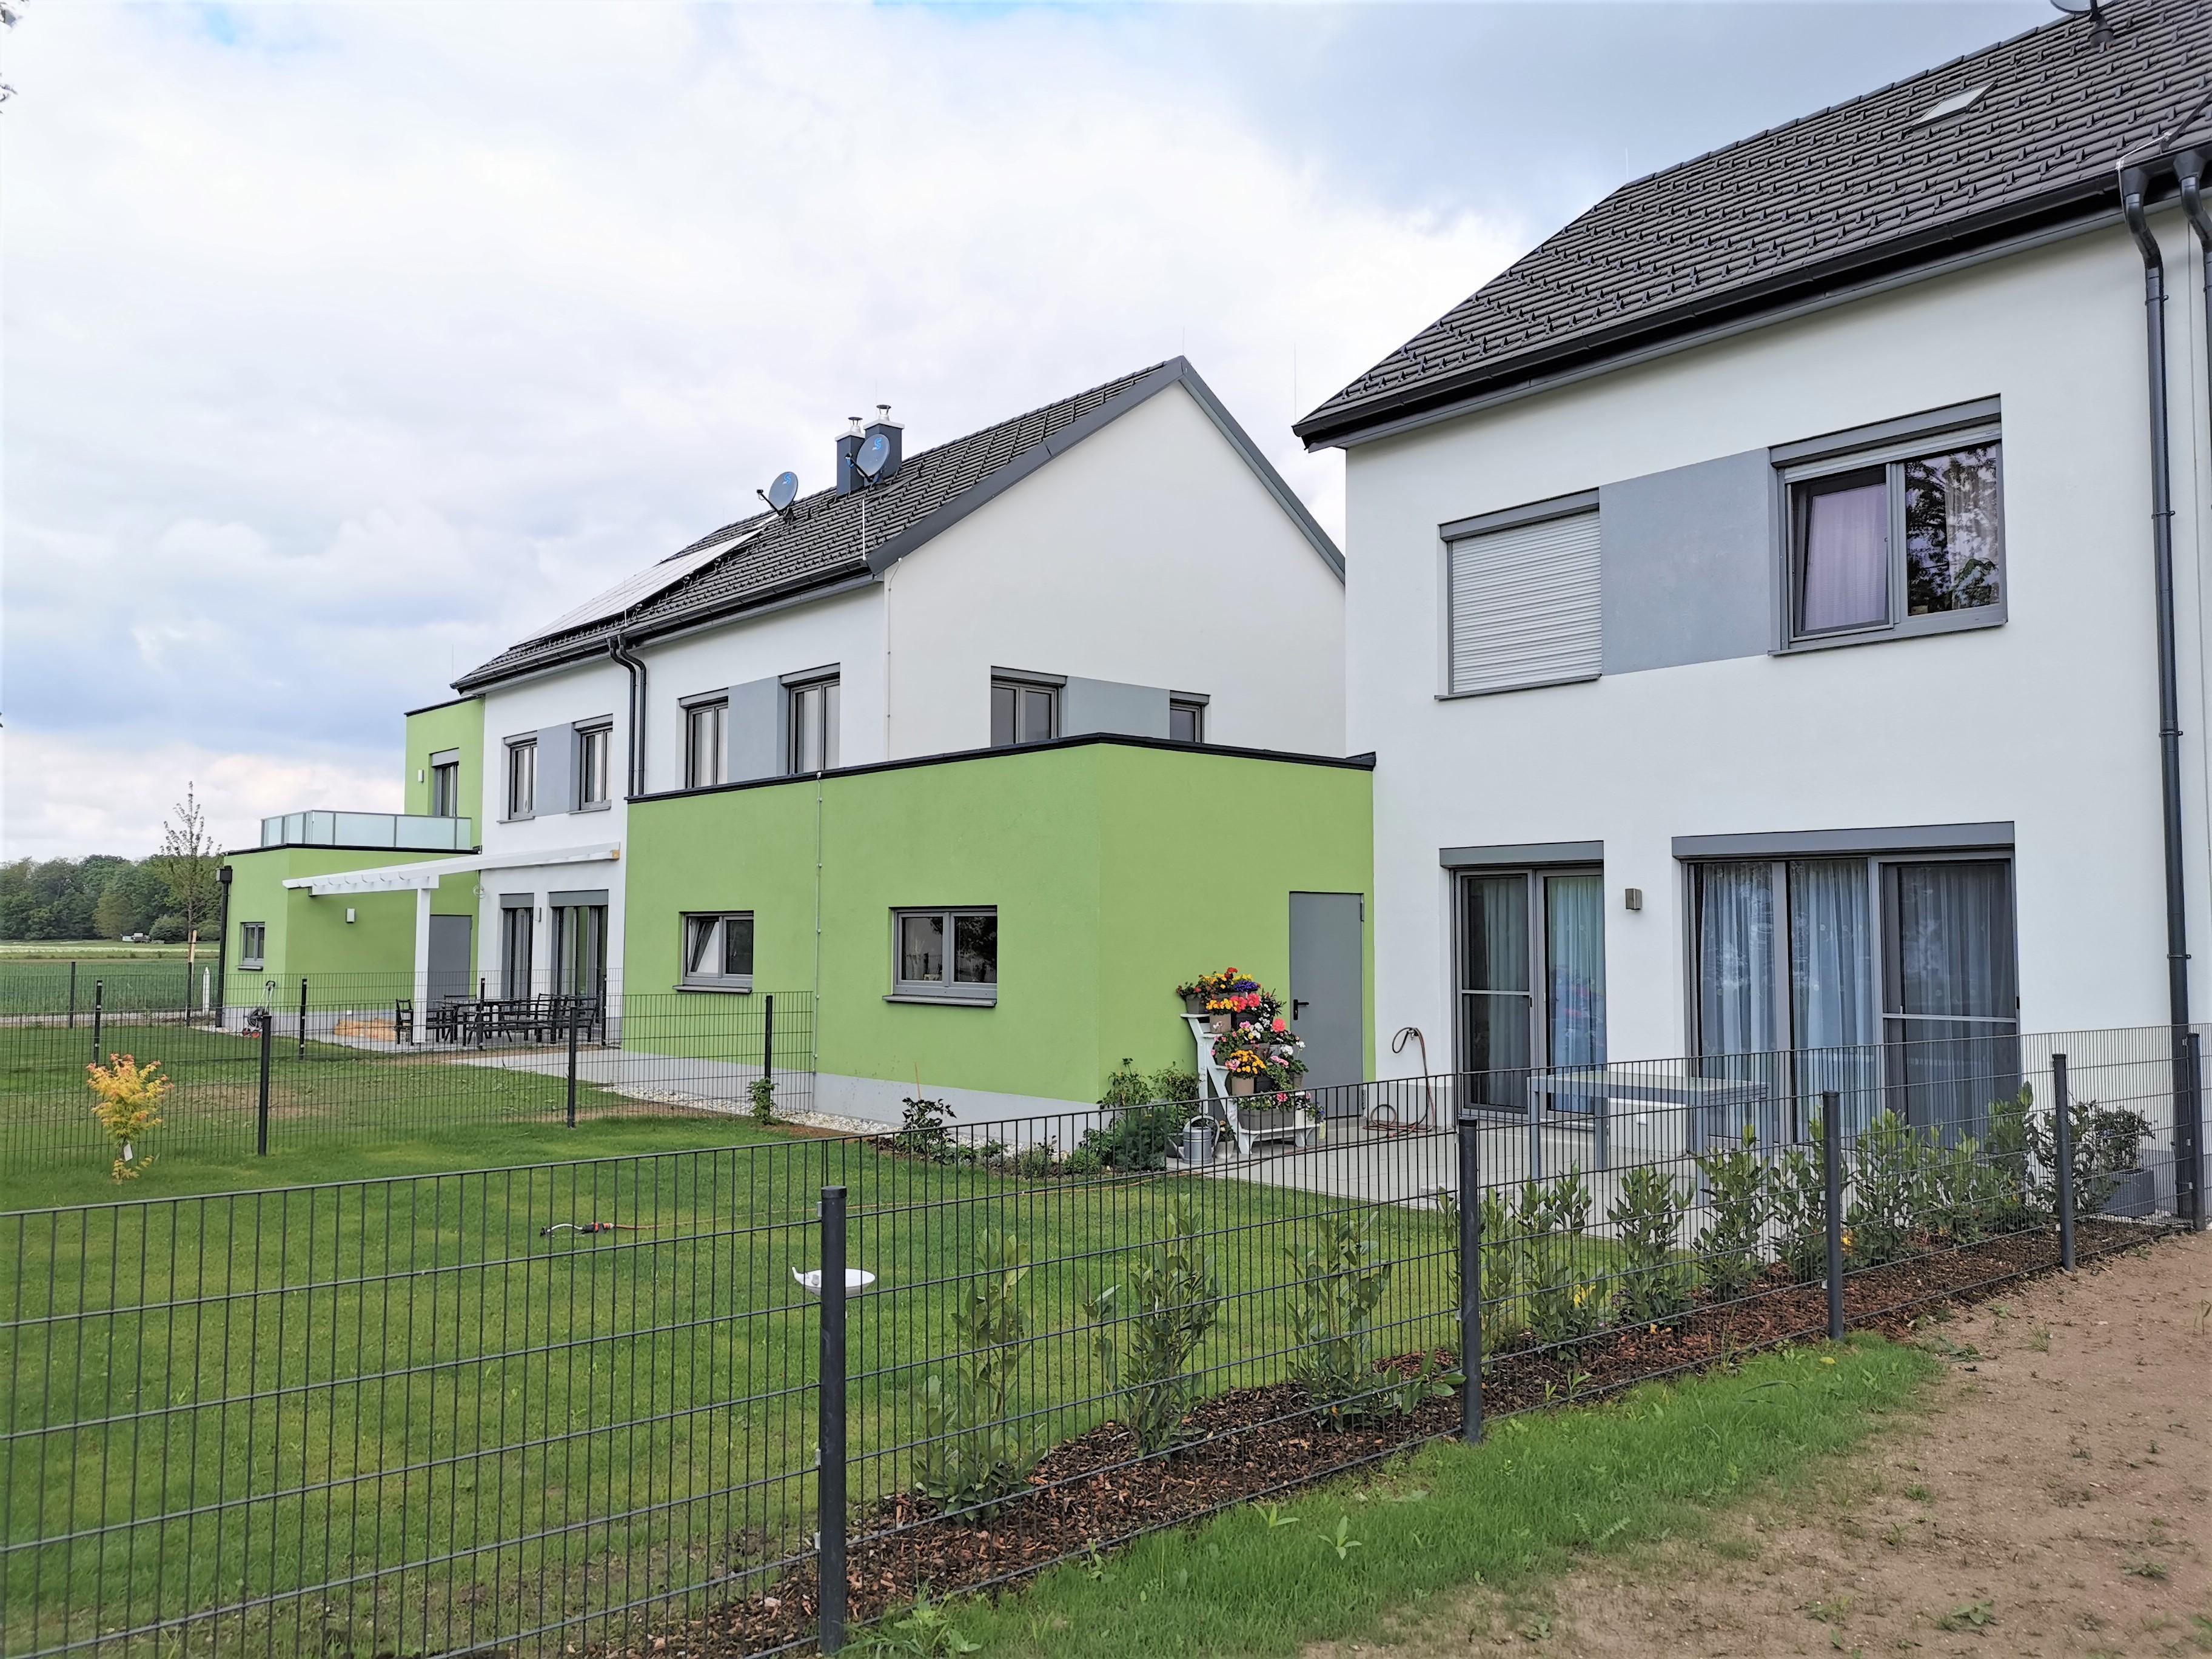 Immobilie von Kamptal in 2136 Laa an der Thaya, Mistelbach, Laa/Thaya XVIII - Top 7 #6